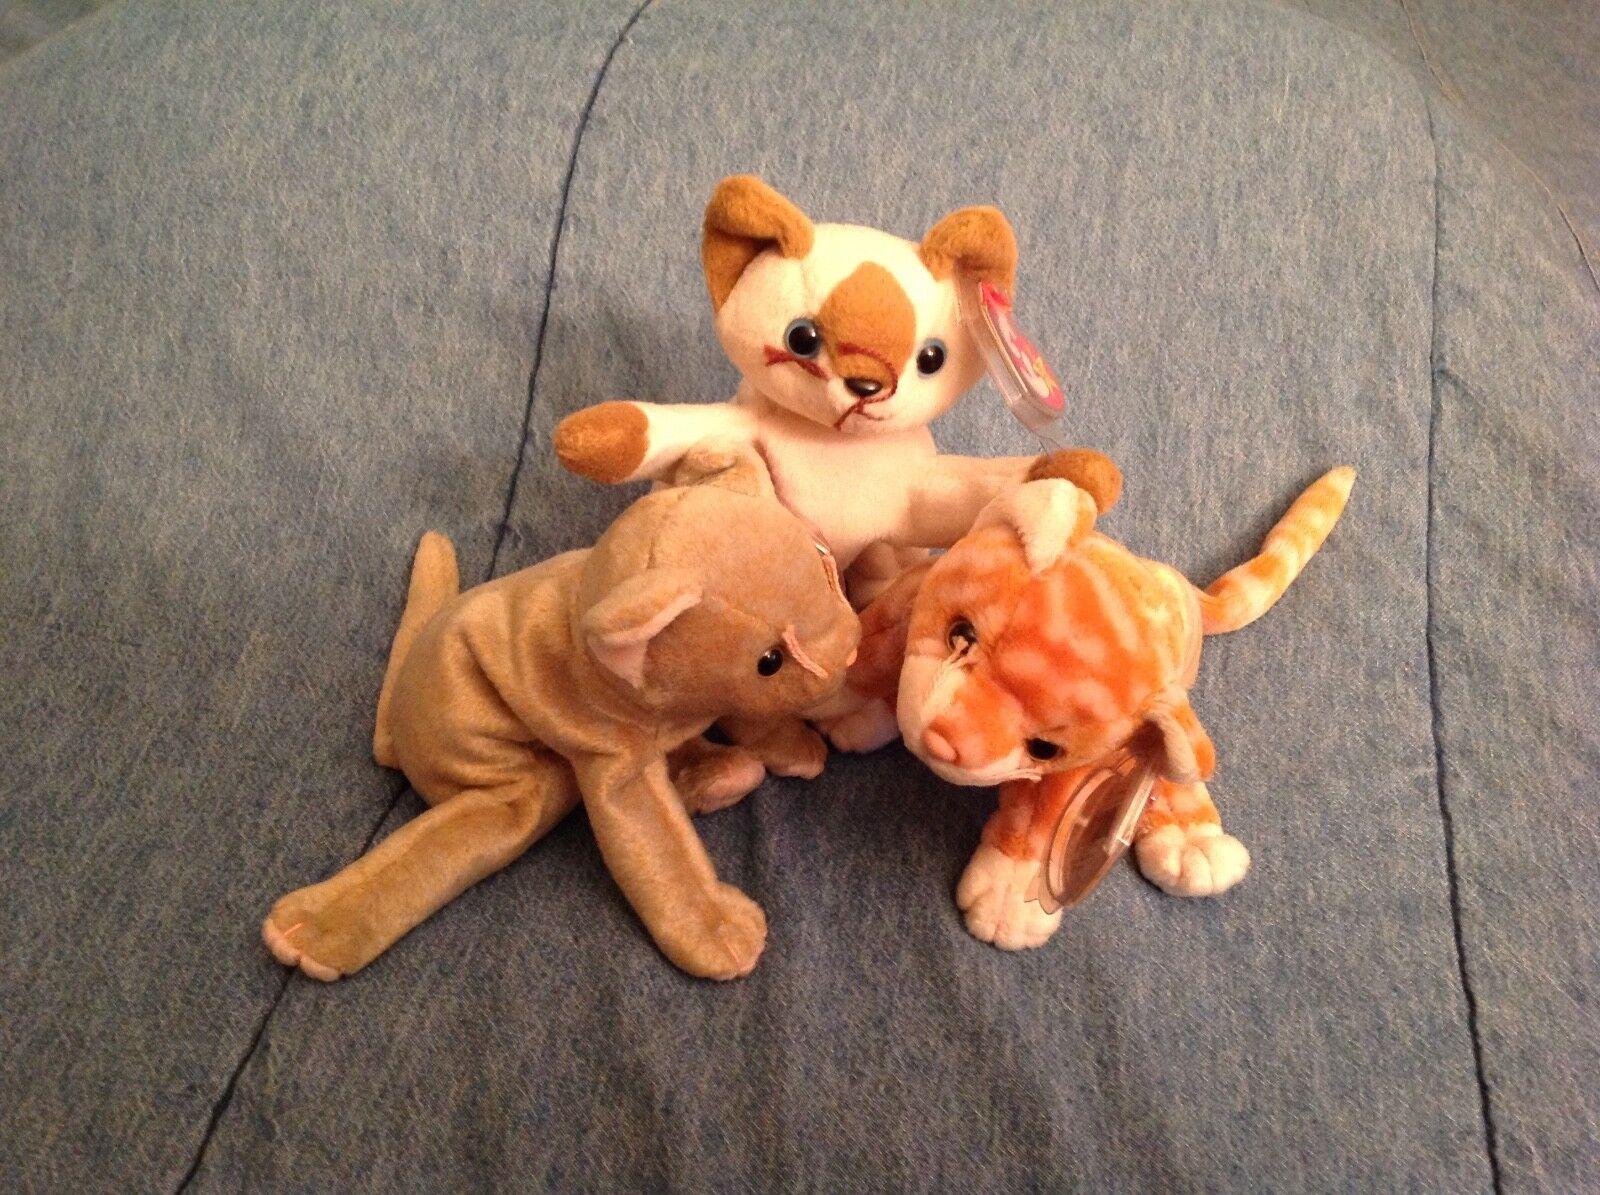 SET OF 3 MINT MINT MINT RETIRED CAT BEANIES = SCAT (BROWN), SNIP (SIAMESE) & AMBER (TABBY) e6d72f